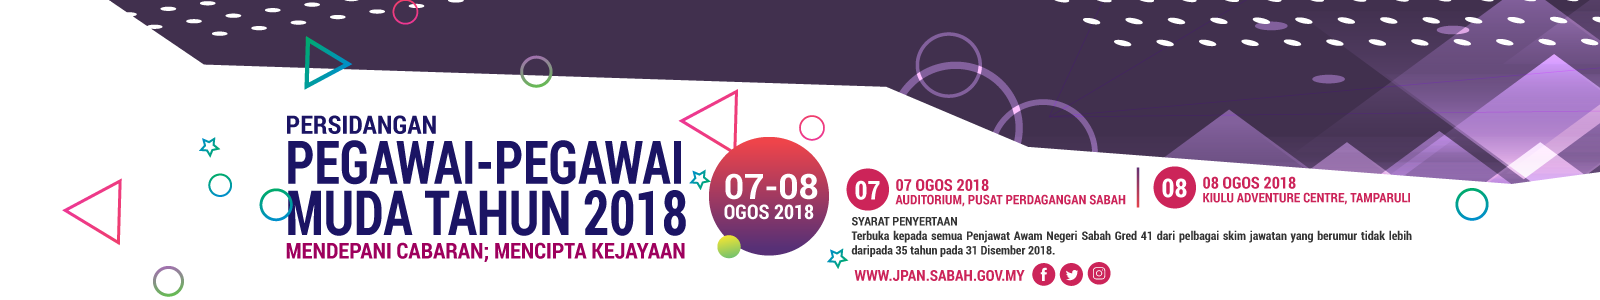 Persidangan Pegawai Pegawai Muda 2018